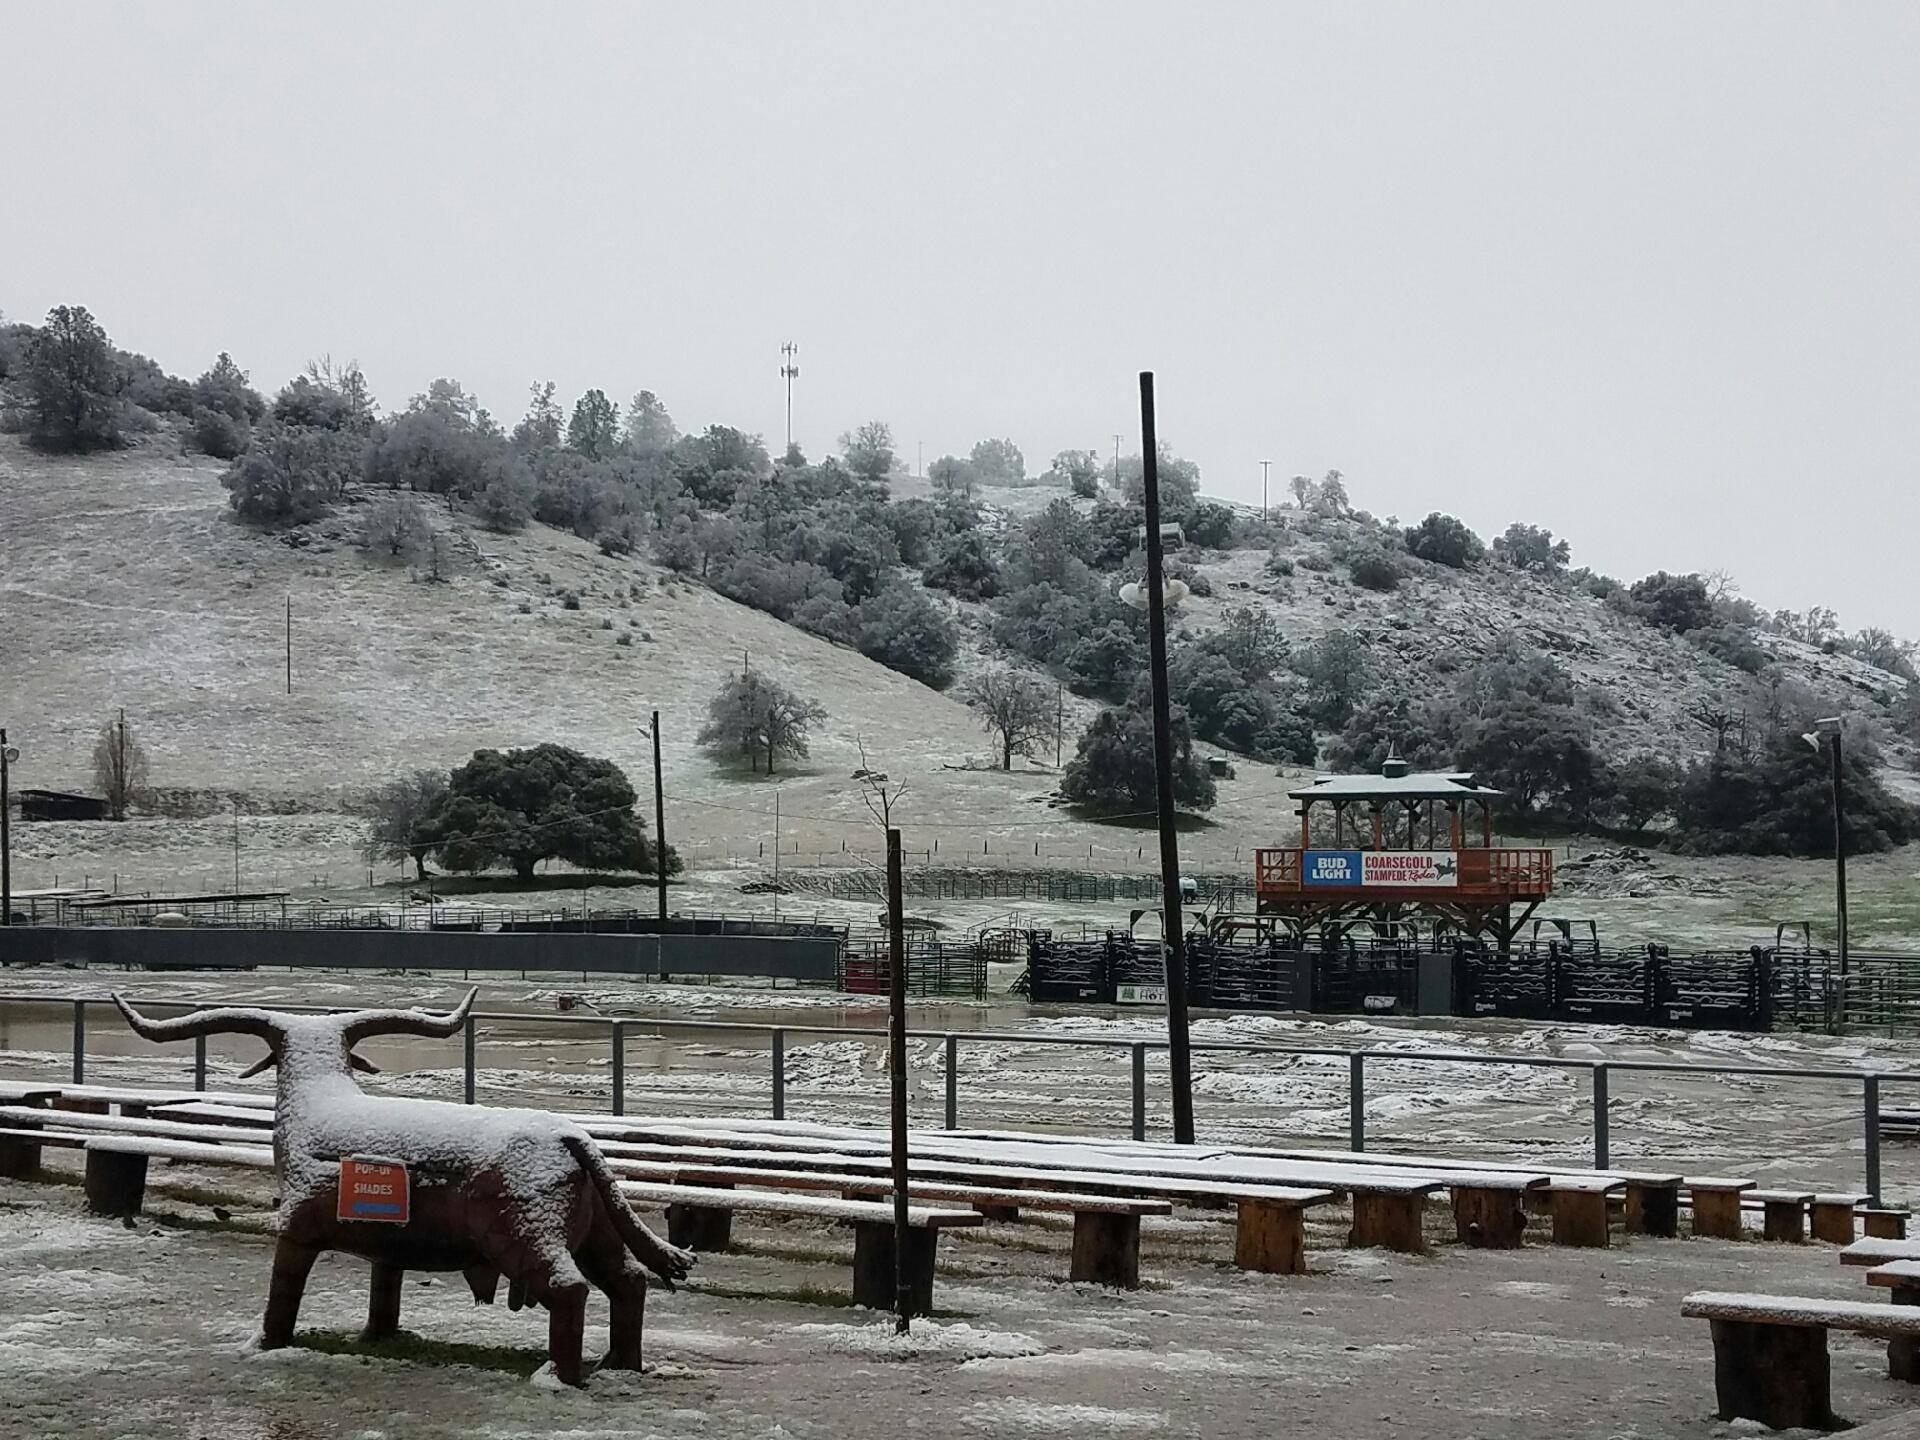 Coarsegold Arena